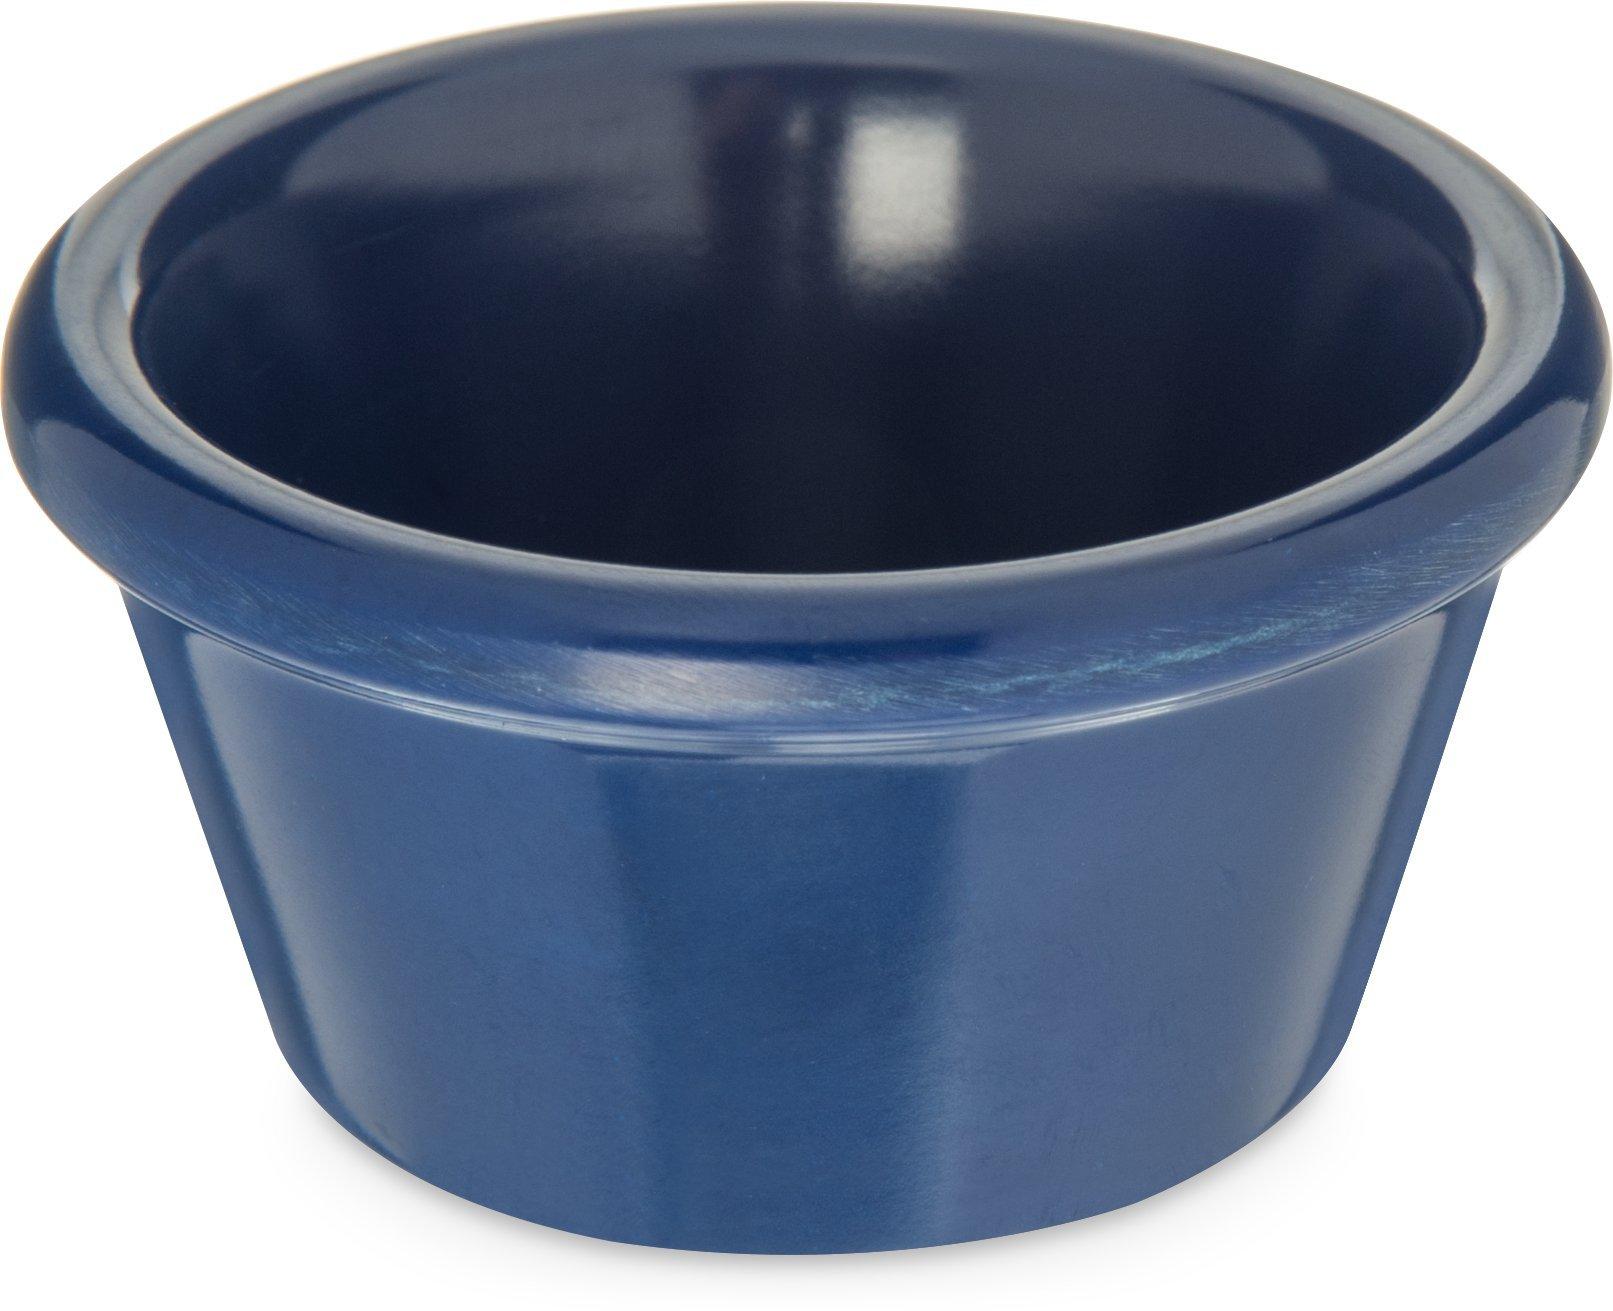 Carlisle 085260 Melamine Smooth Ramekin, 2 oz. Capacity, Cobalt Blue (Case of 72)